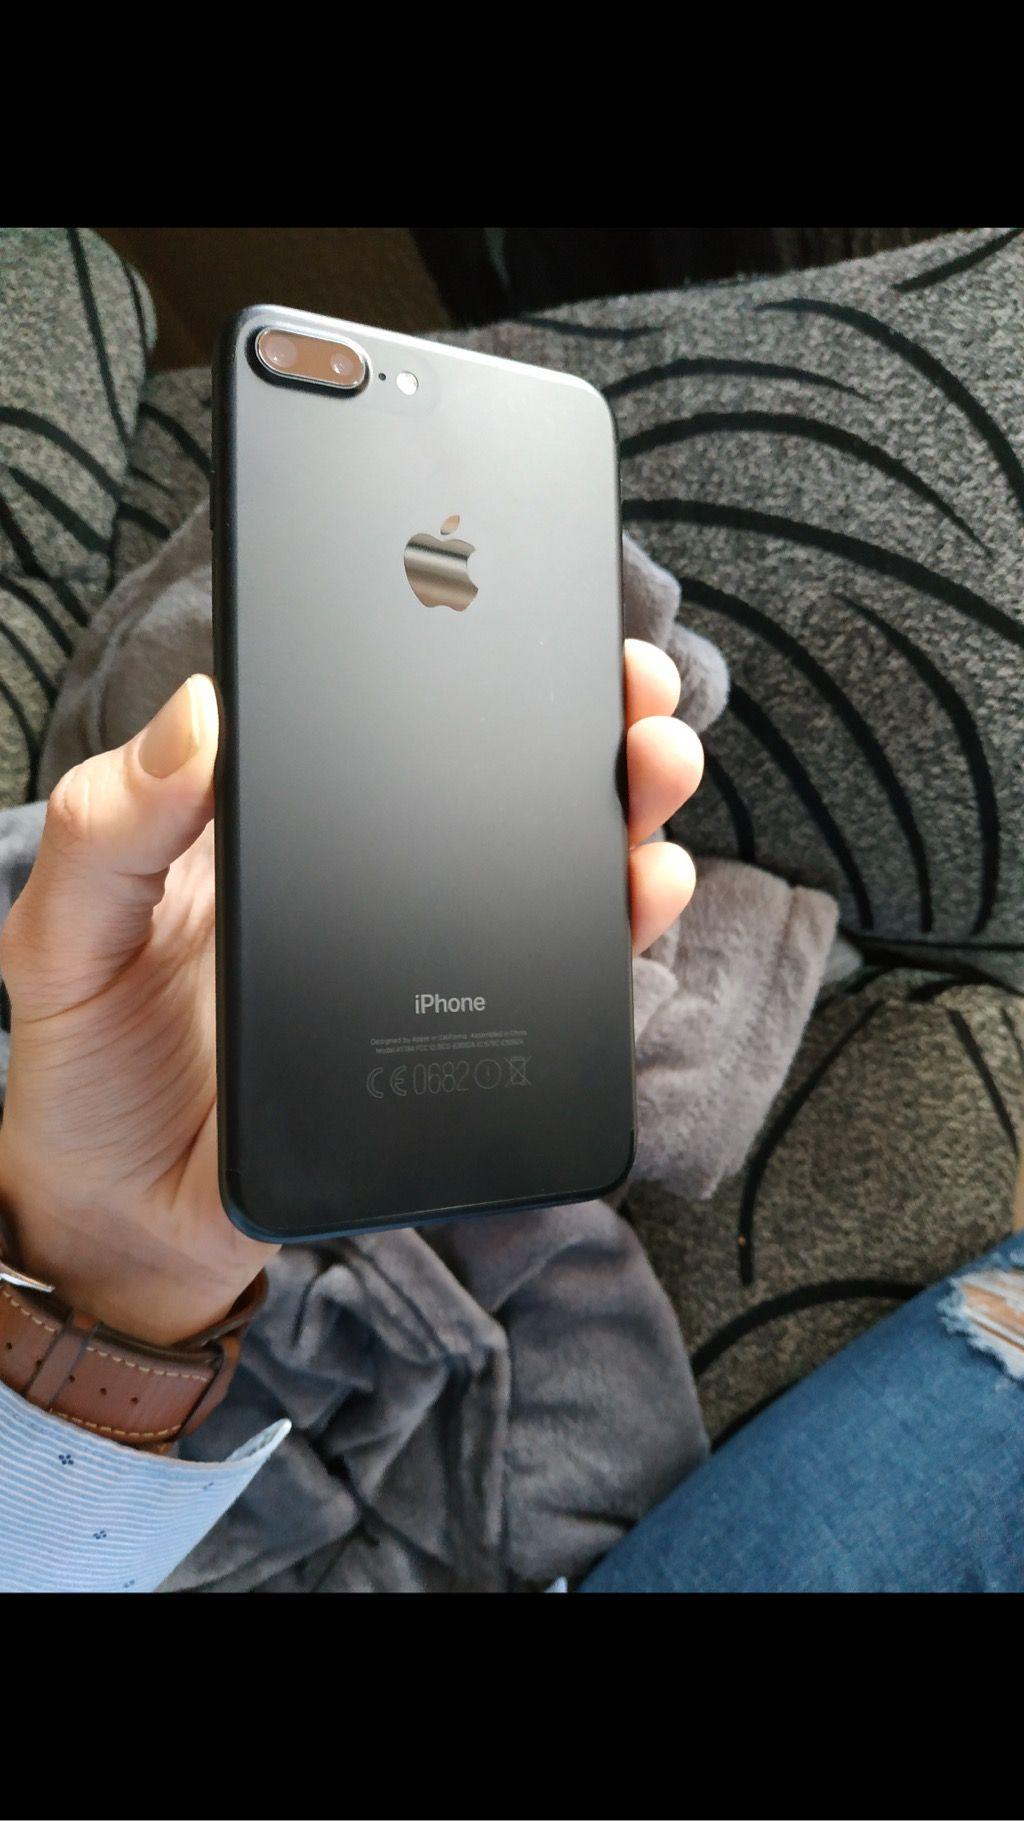 5c42a62f6ca Iphone 7 Plus 32 GB Space Grey - España - IPhone 7 Plus negro, impecable